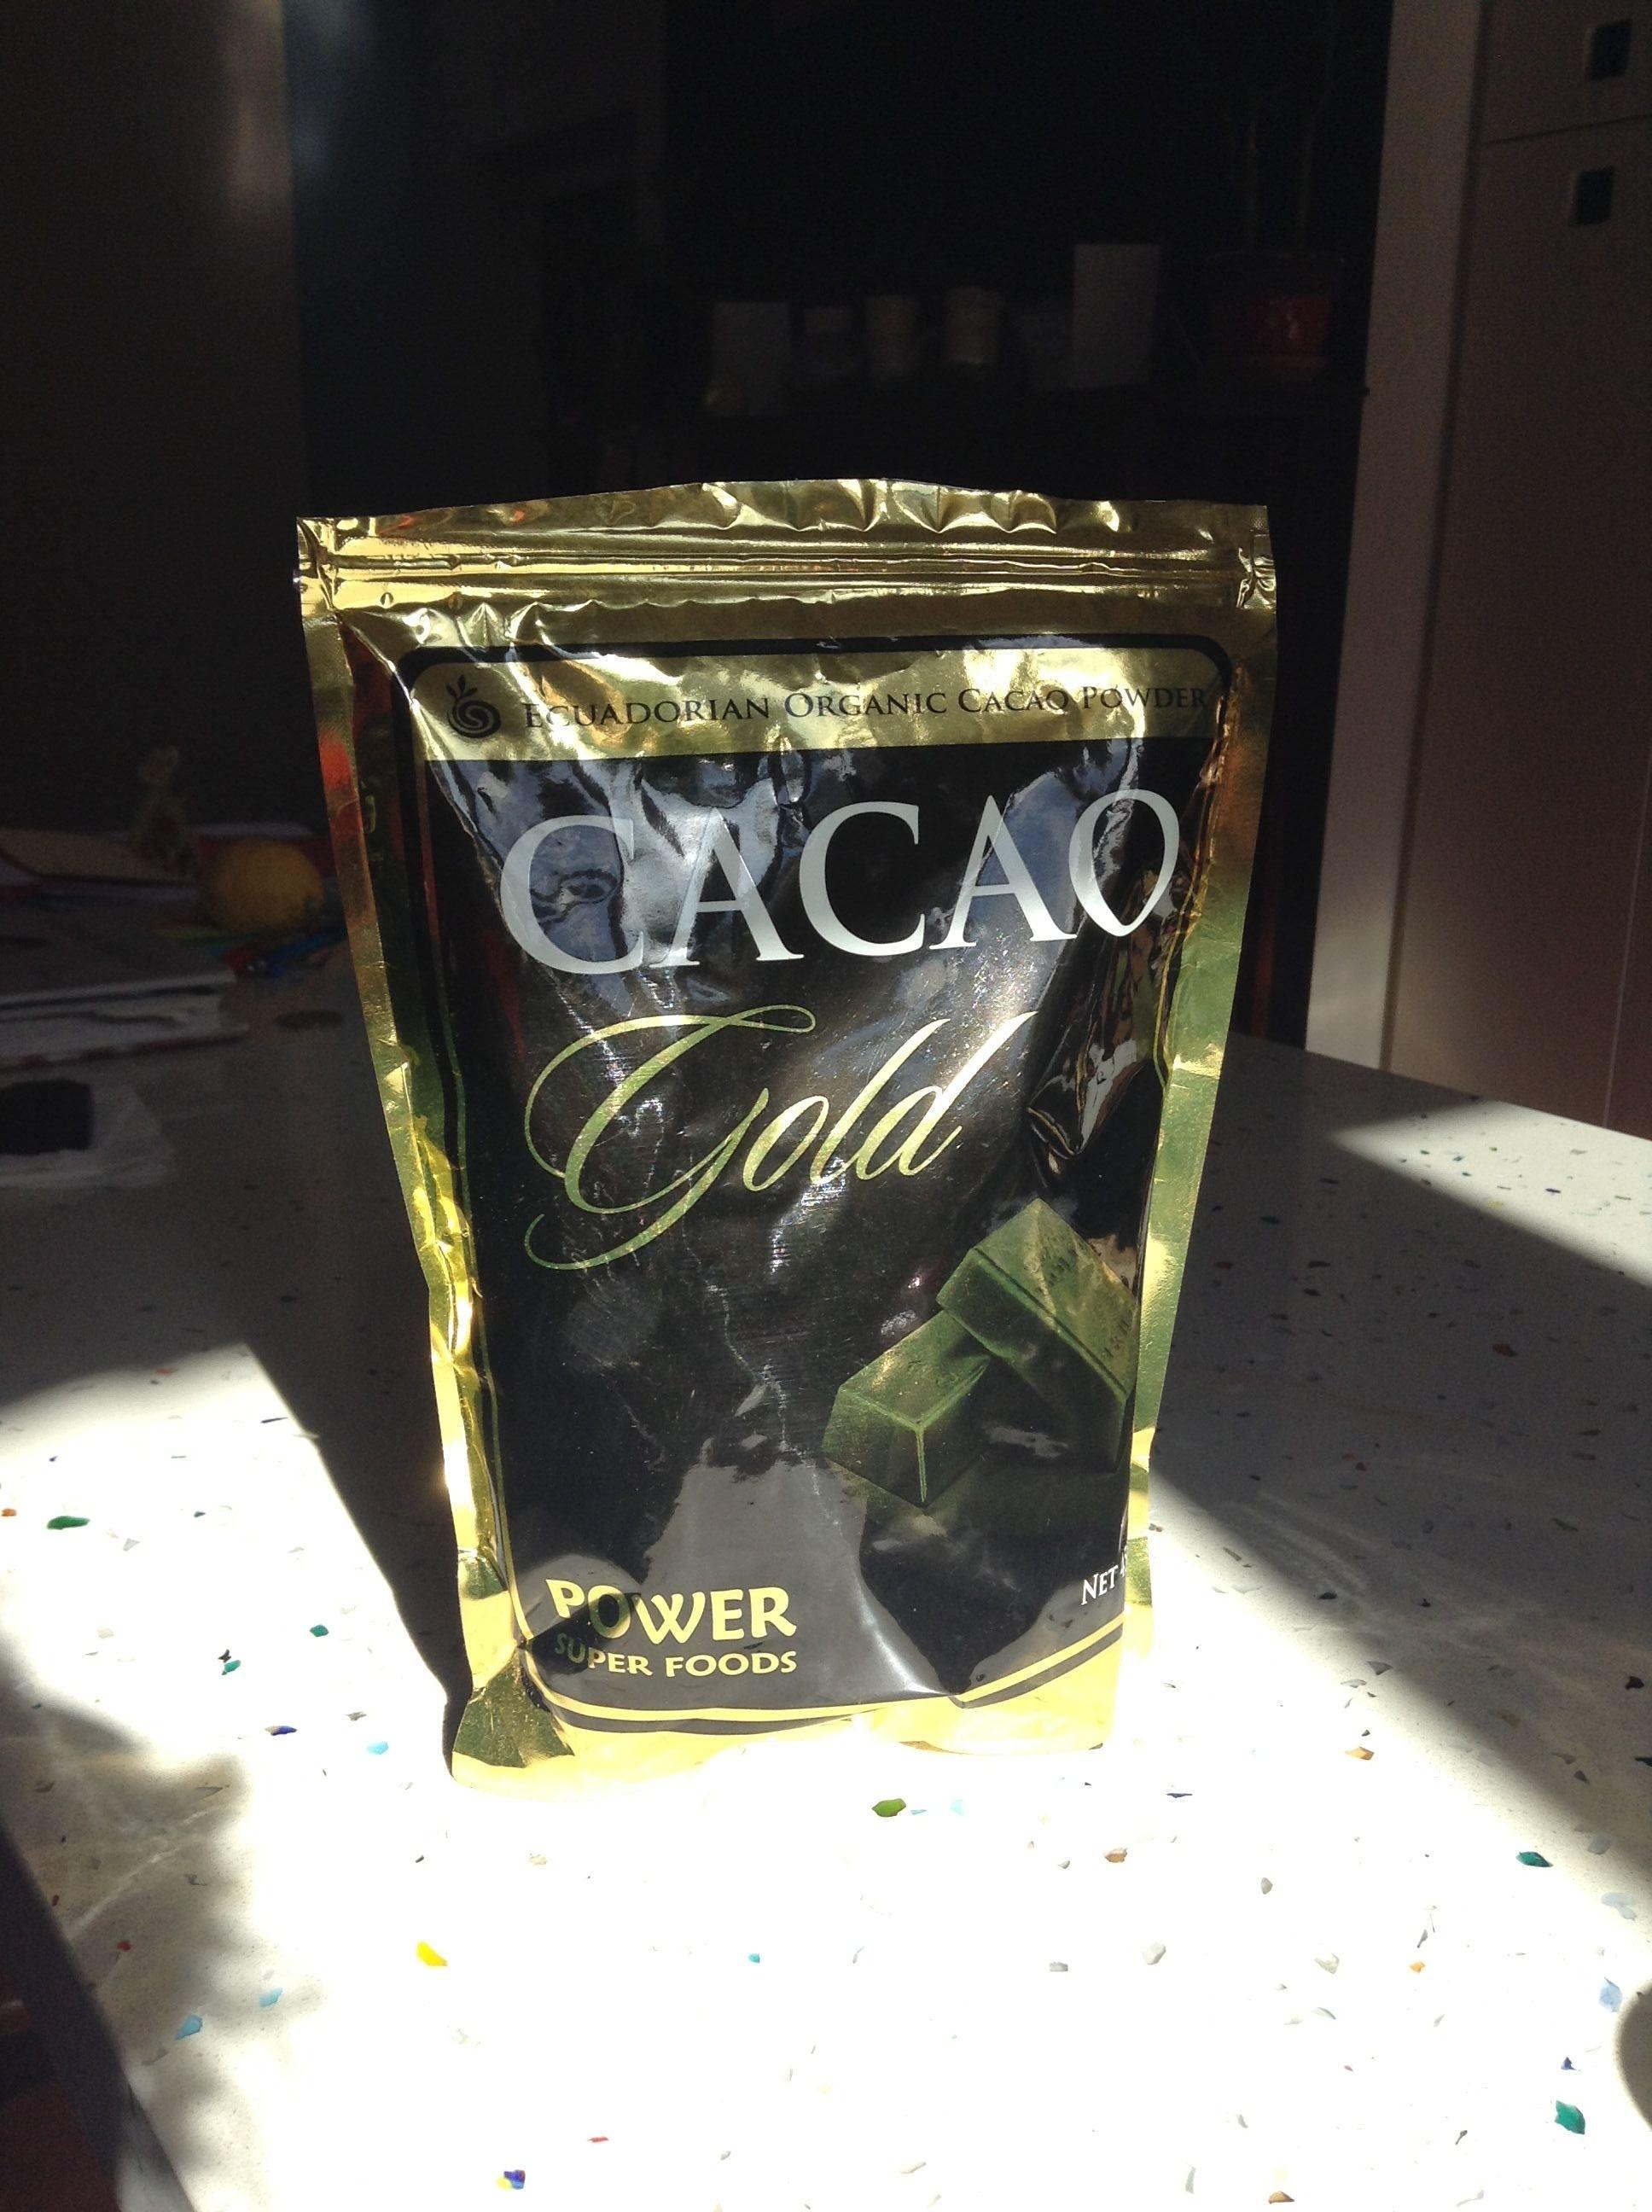 Ecuadorian Organic Cacao Powder Cacao Gold - Product